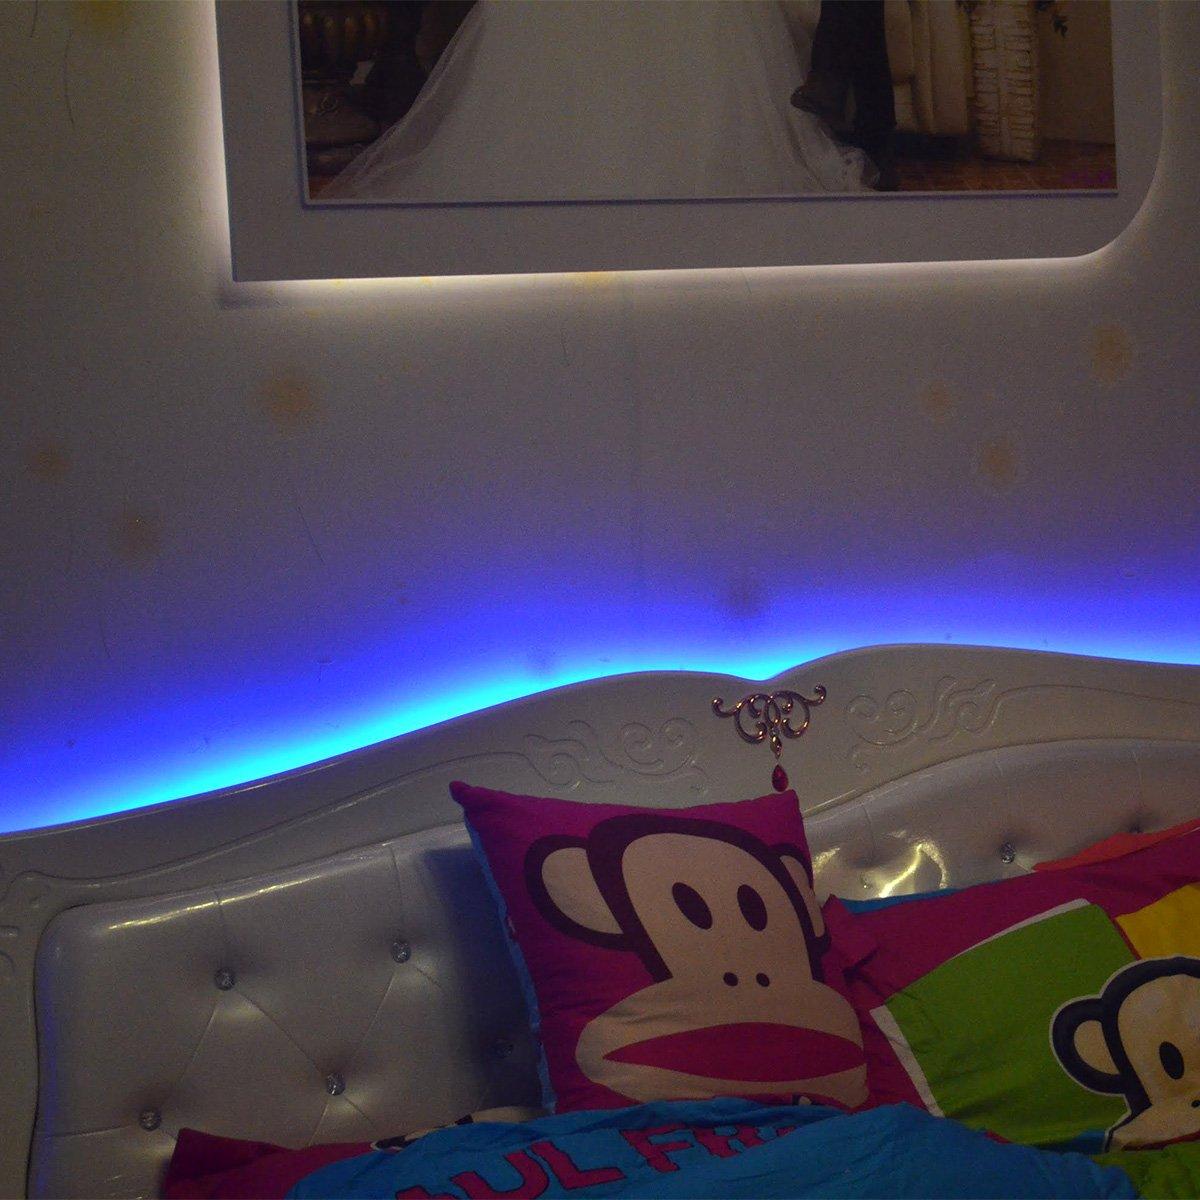 epbowpt RGB Tira LED 32.8/ft//10/m 24/V RGB LED Strip SMD 5050/IP65/resistente al agua 600LEDs el cambio de color 60leds//m LED Banda Barra de luz solo un listones de luz